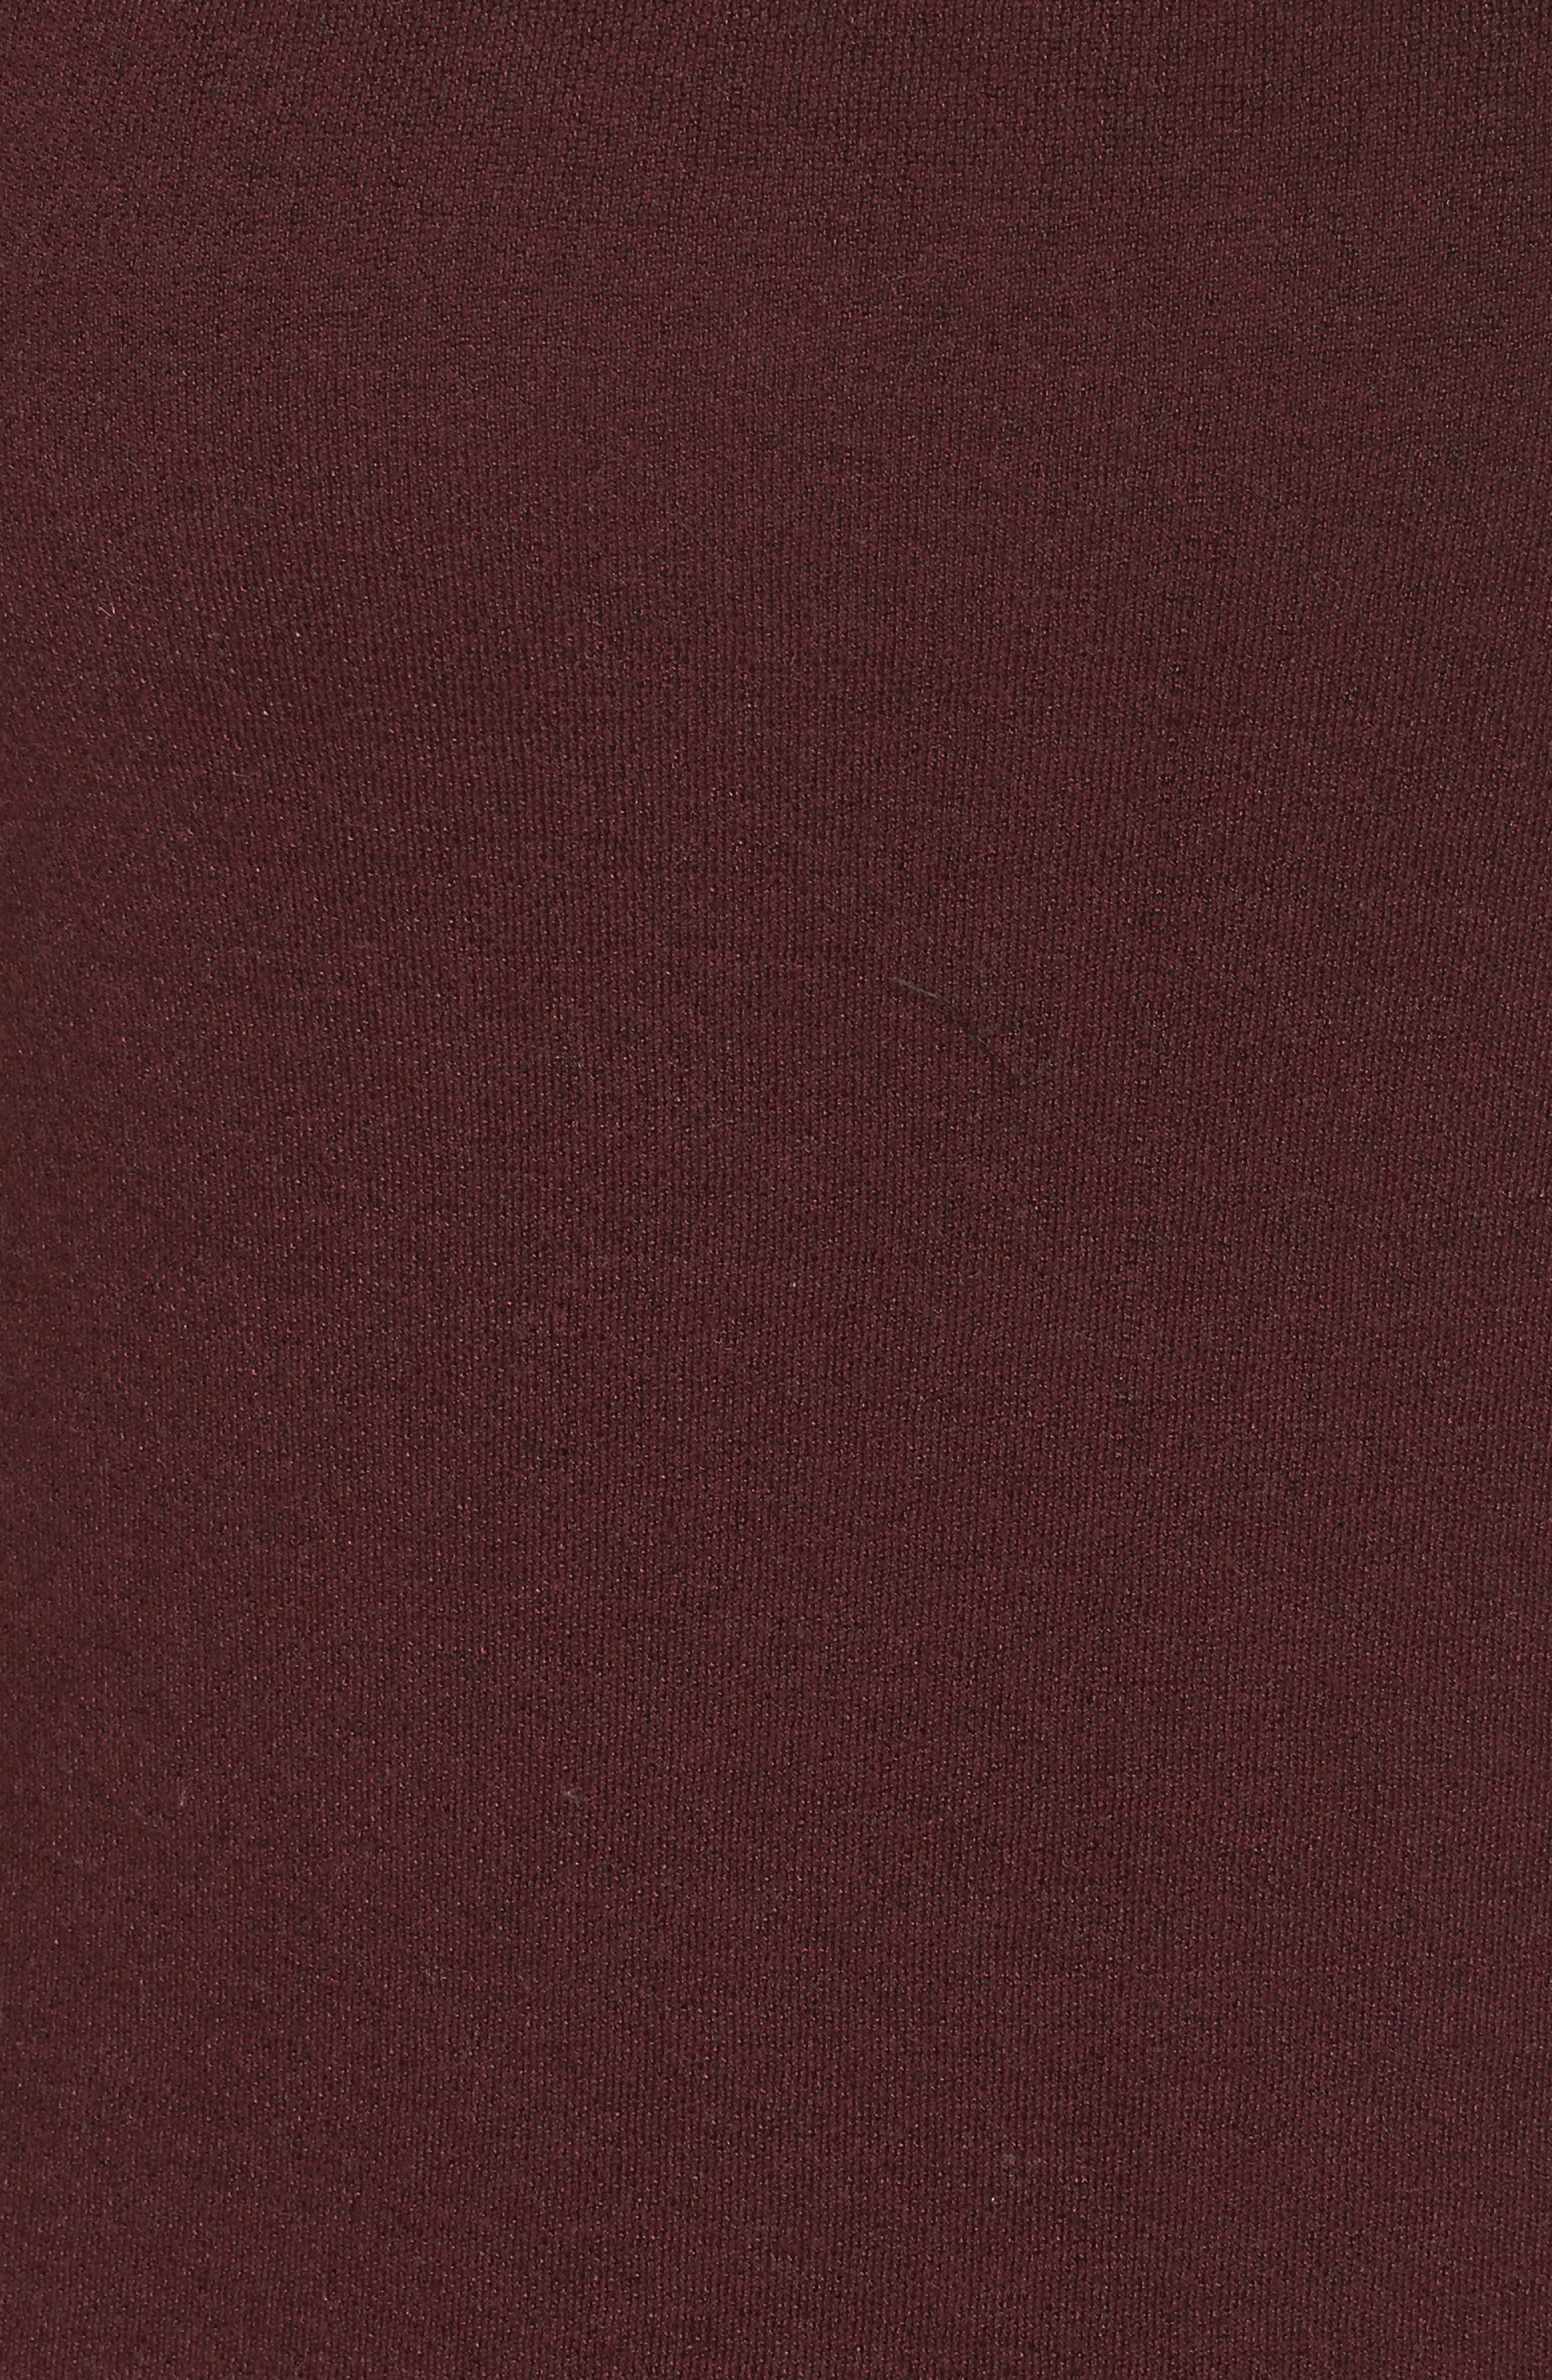 NIC + ZOE Falling Studs Embellished Sheath Dress,                             Alternate thumbnail 5, color,